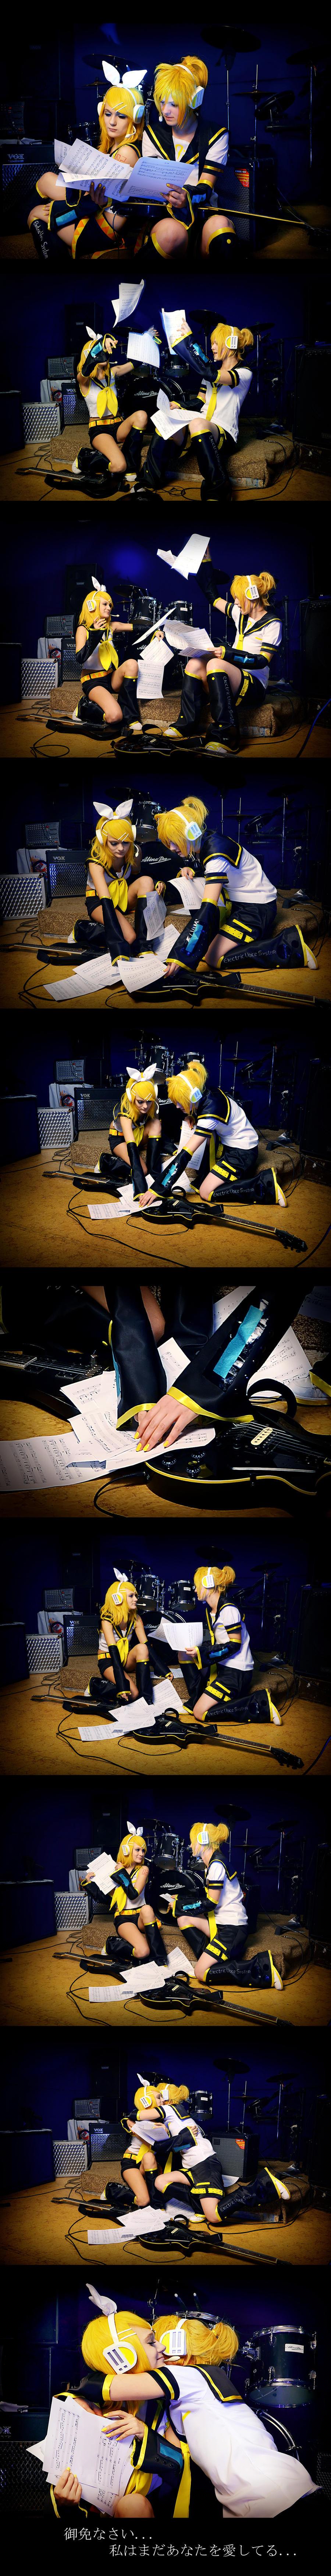 Little story Vocaloid twins by WanderingKai